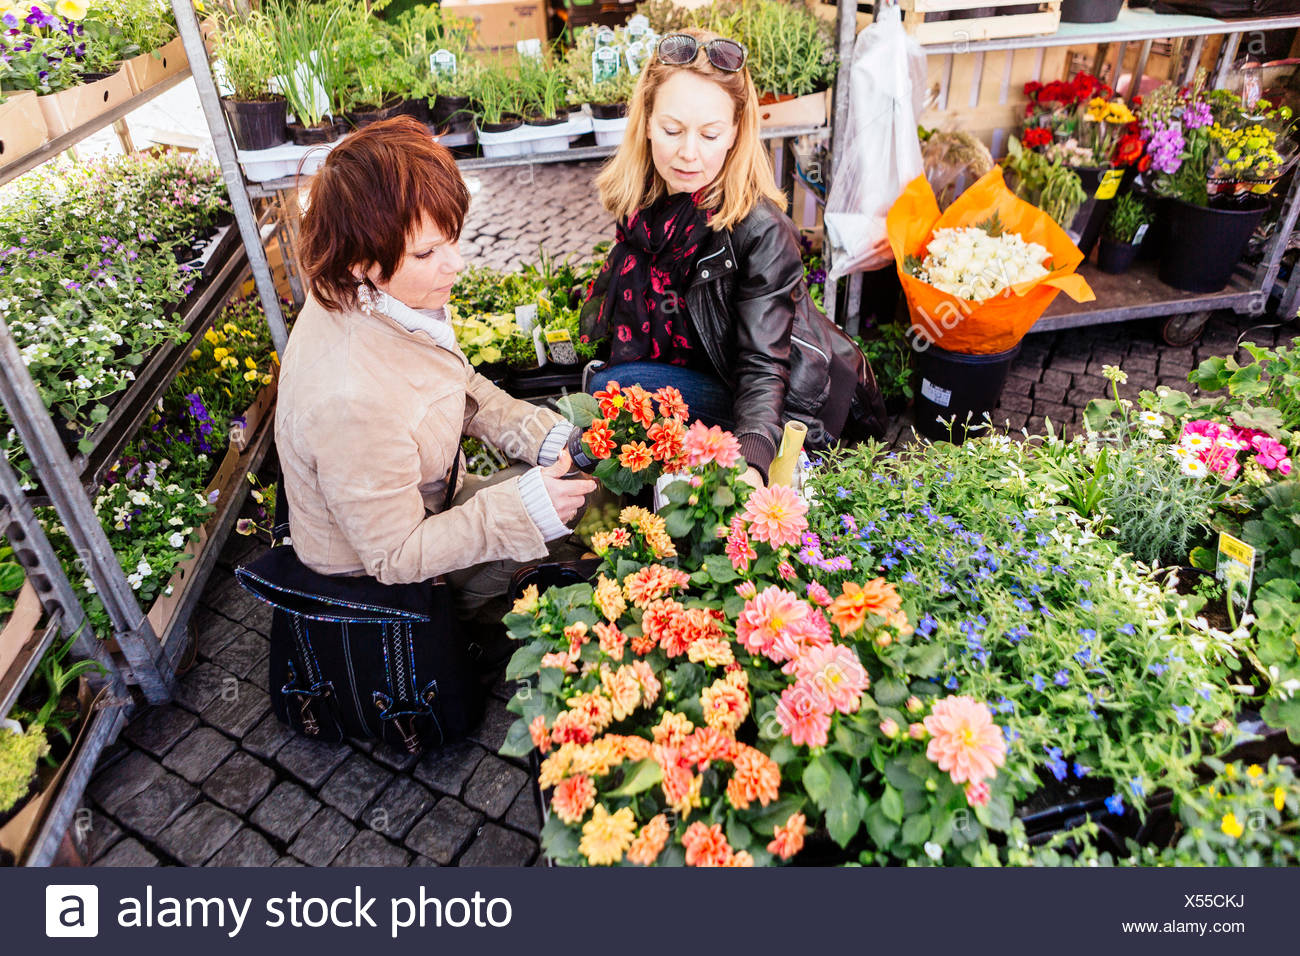 Mature women buying flower plants in market - Stock Image